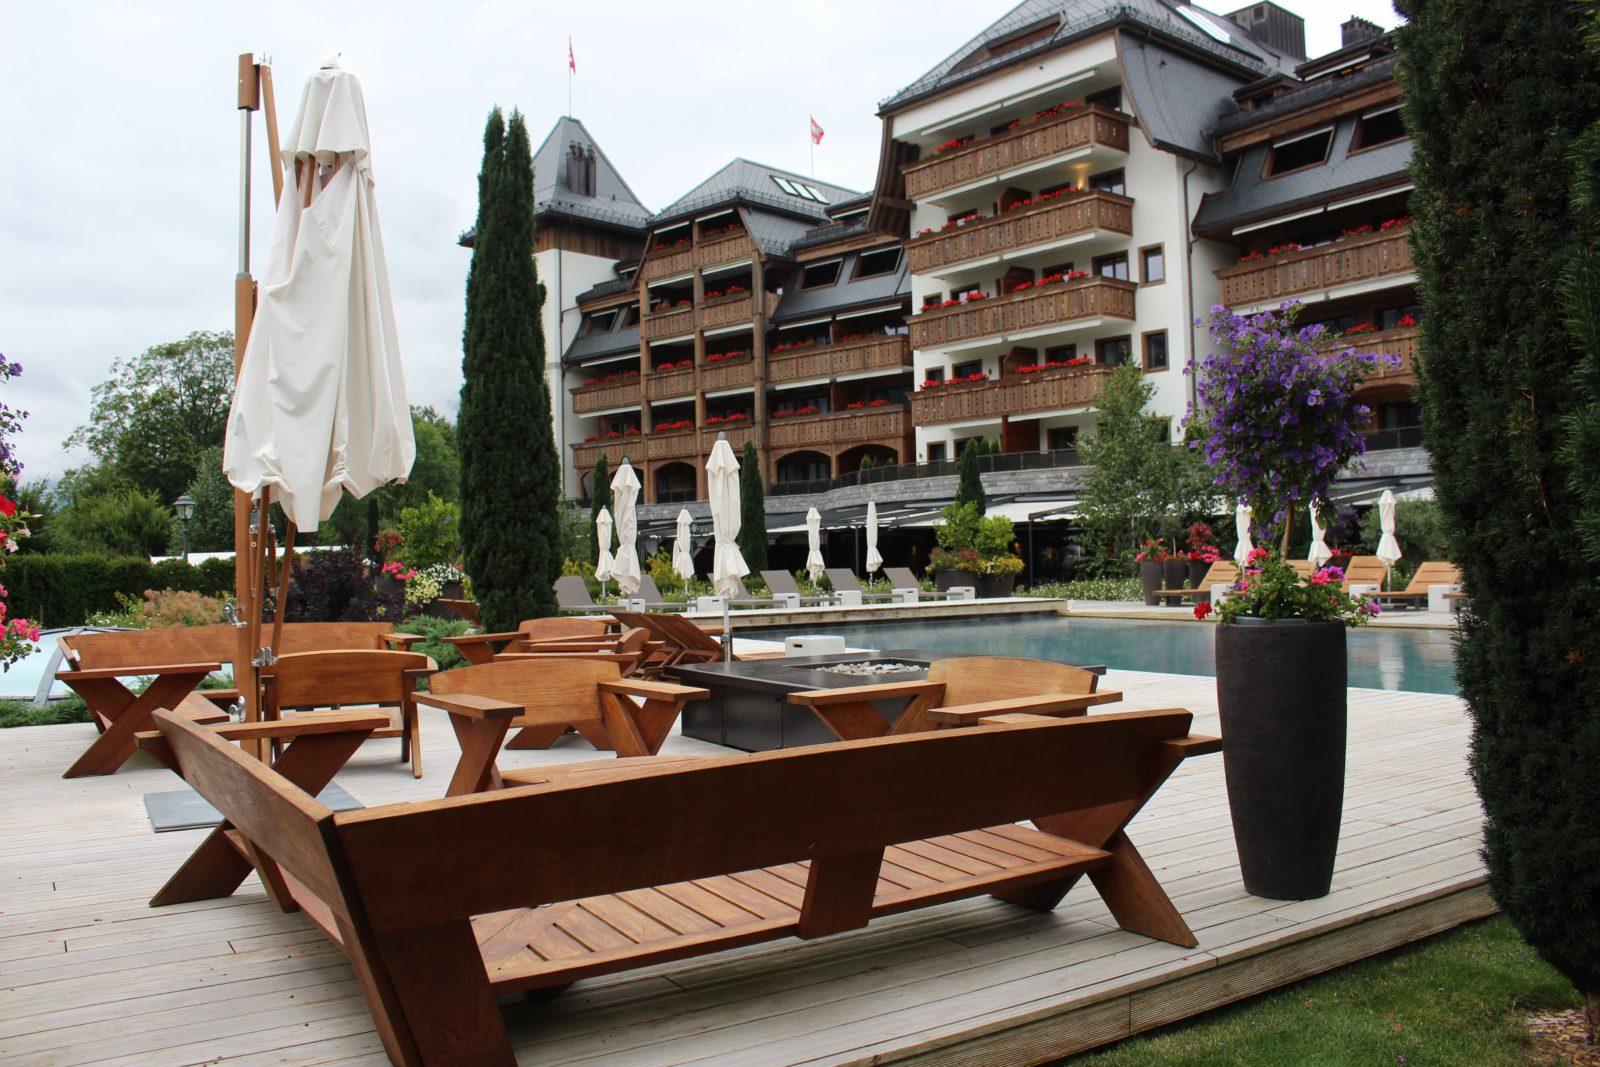 Hôtel Alpina Gstaad vu du parc